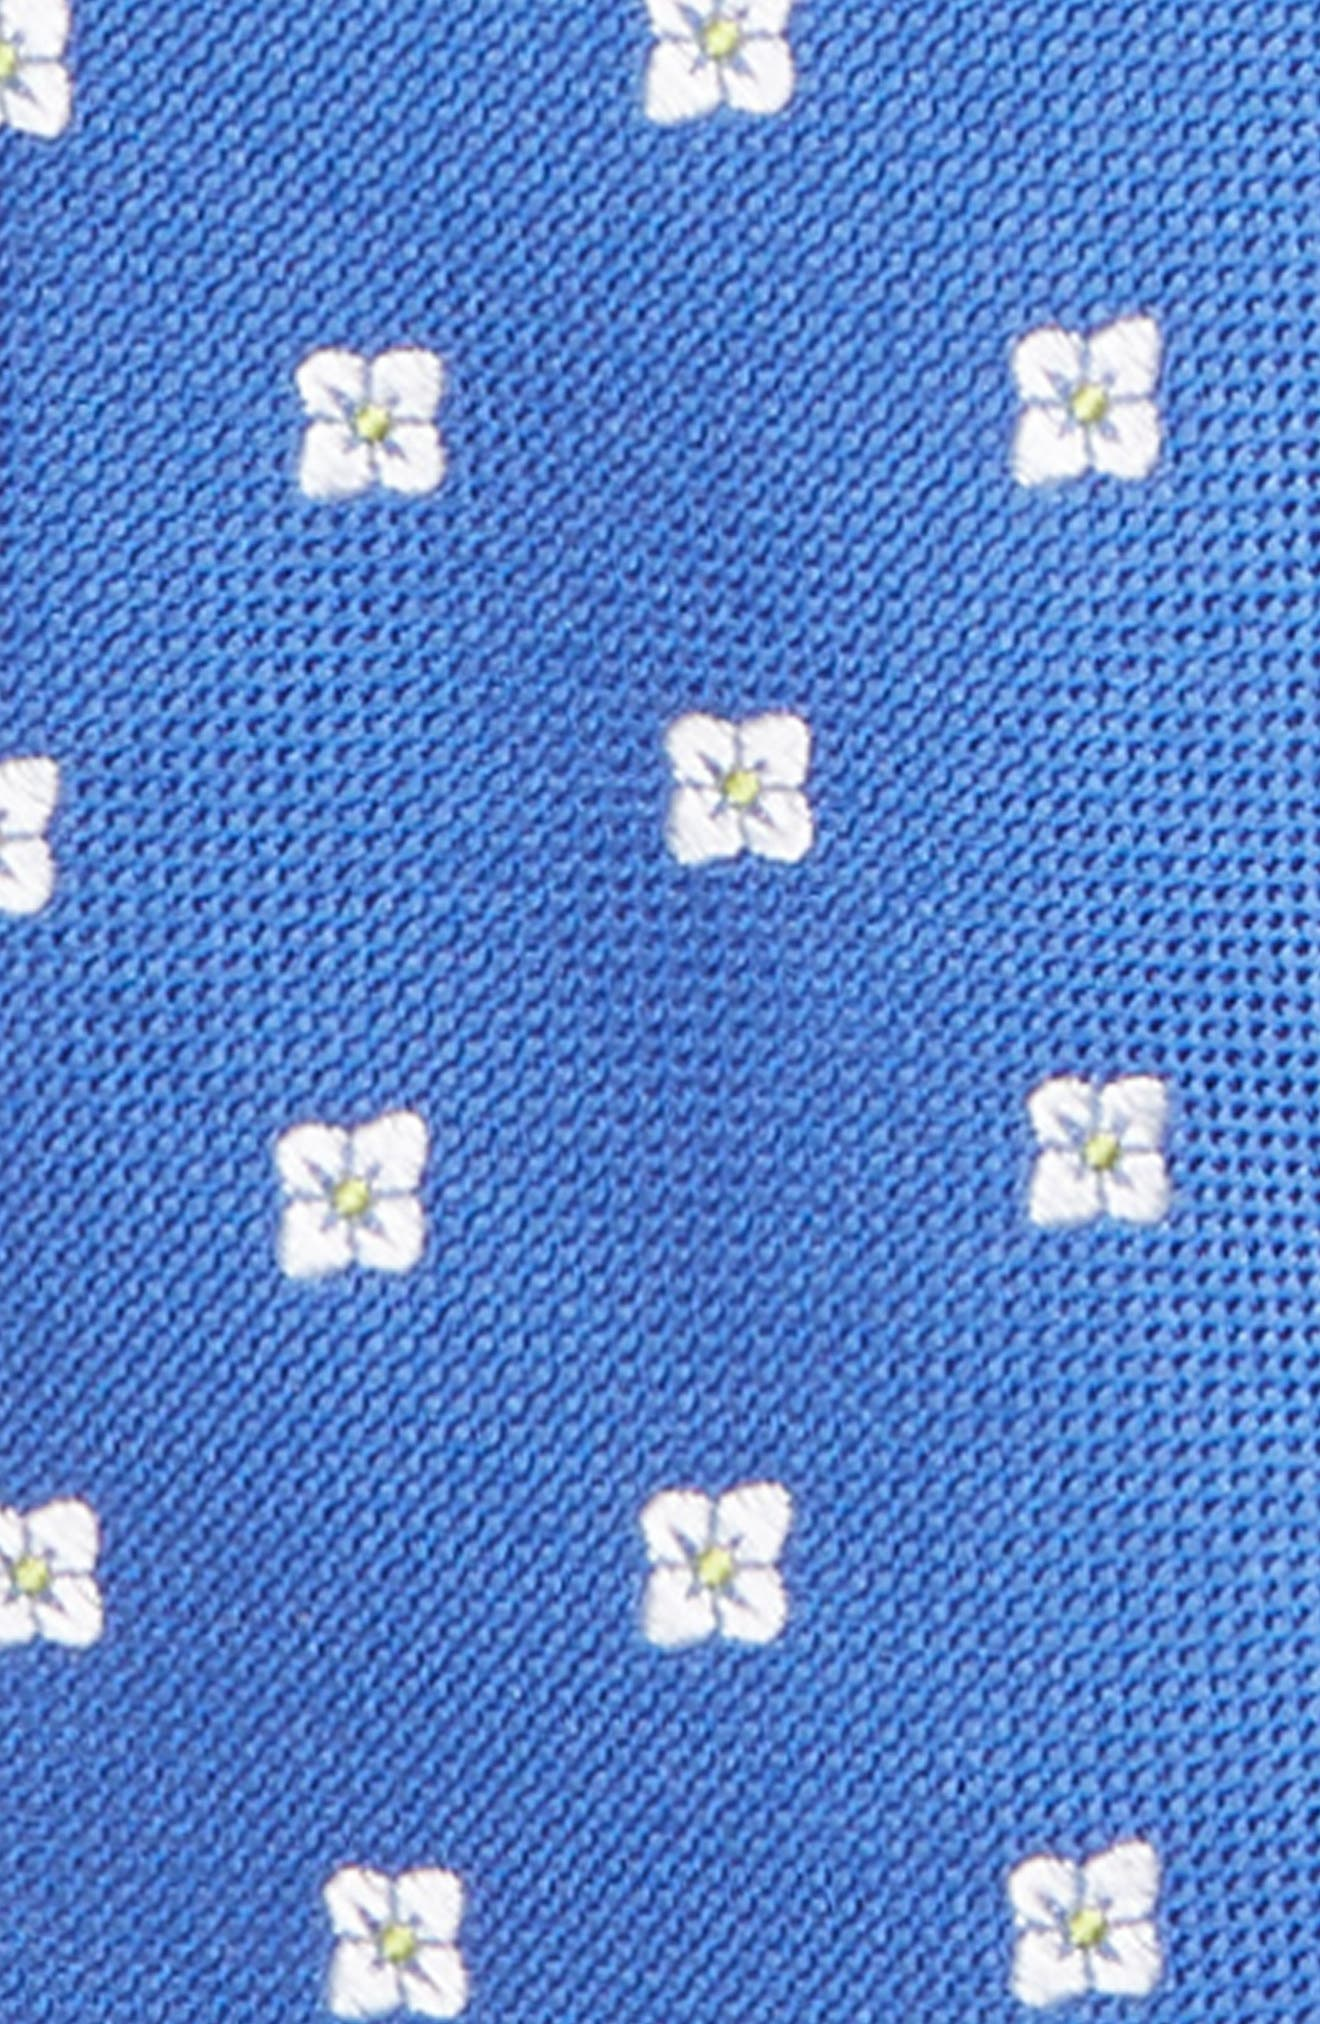 NORDSTROM,                             Floral Silk Zip Tie,                             Alternate thumbnail 2, color,                             431